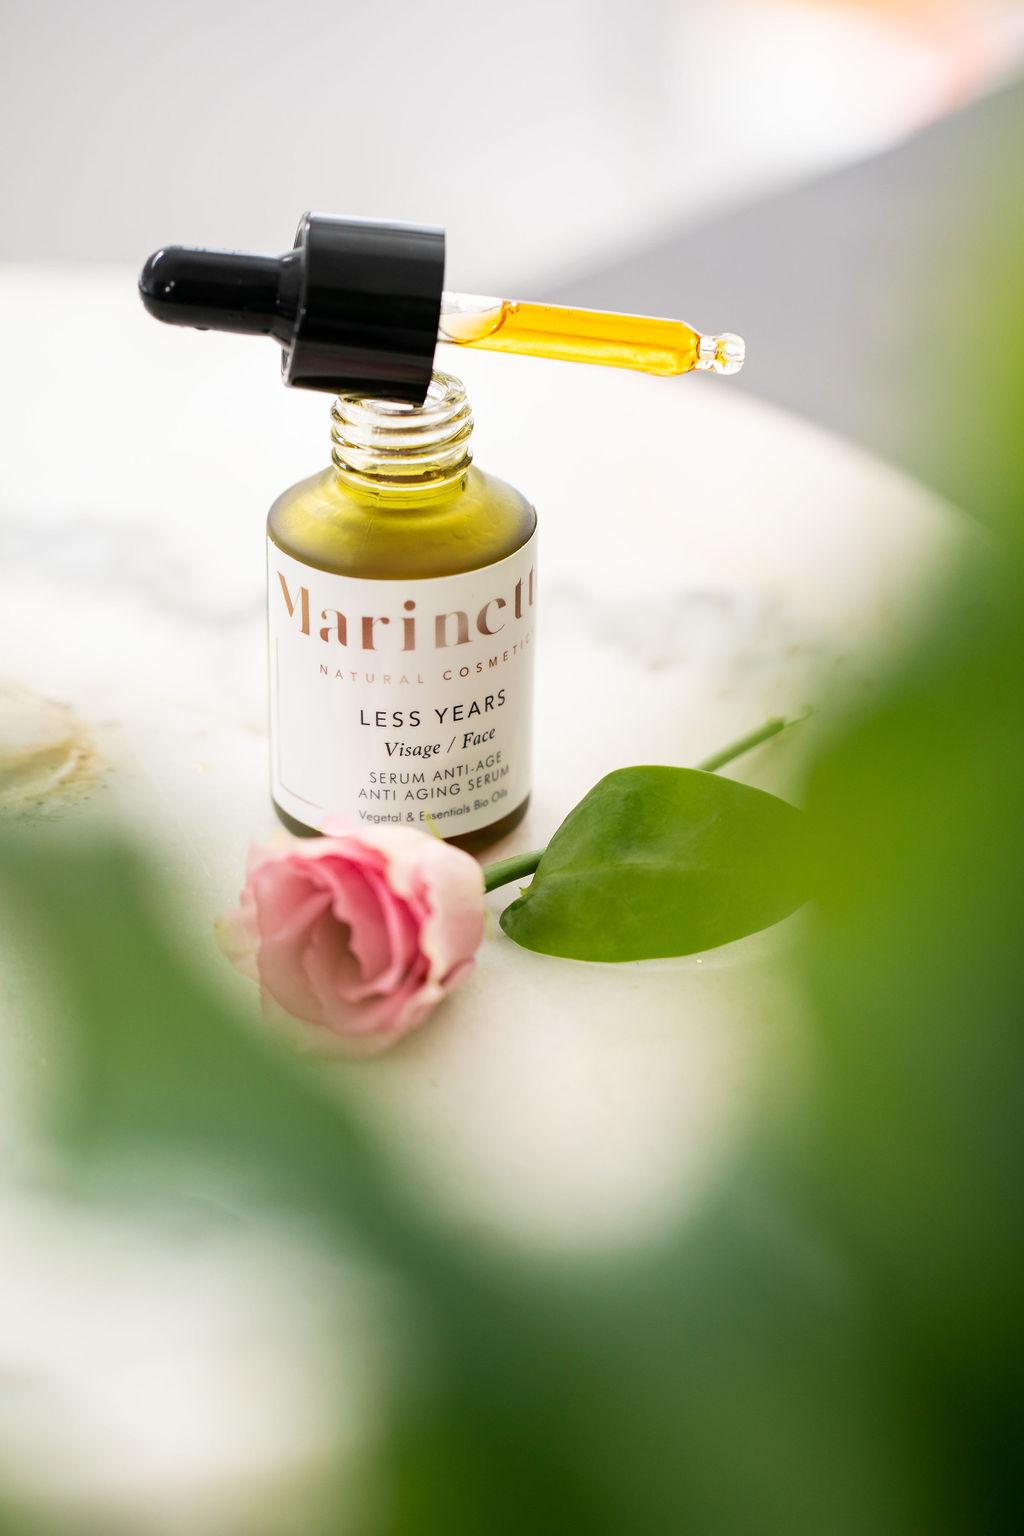 Marinette Beauty